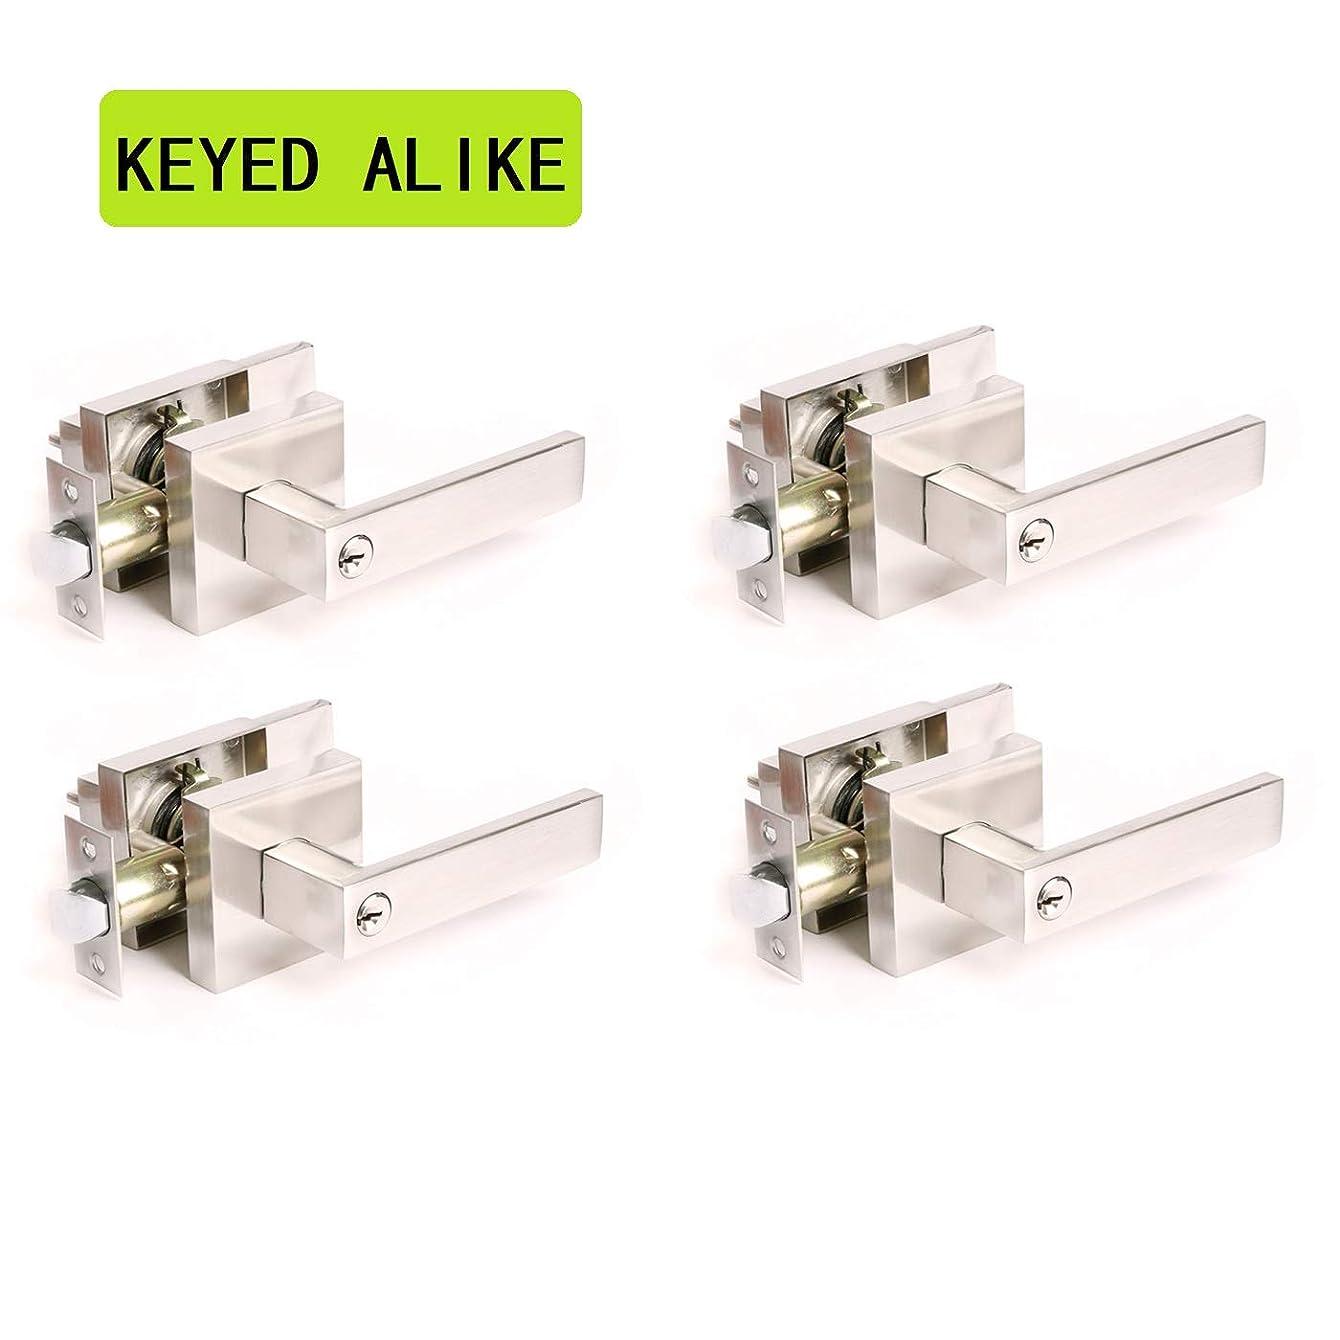 4 Pack Brushed Nickel Finish Flat Lever(Keyed Alike/Combo Keys) Keyed Entry Door Lock/Door Knob Hardware Knob Lever and Front Door Leverset Lockset, 2.2 lb One Lever, Left or Right Handing